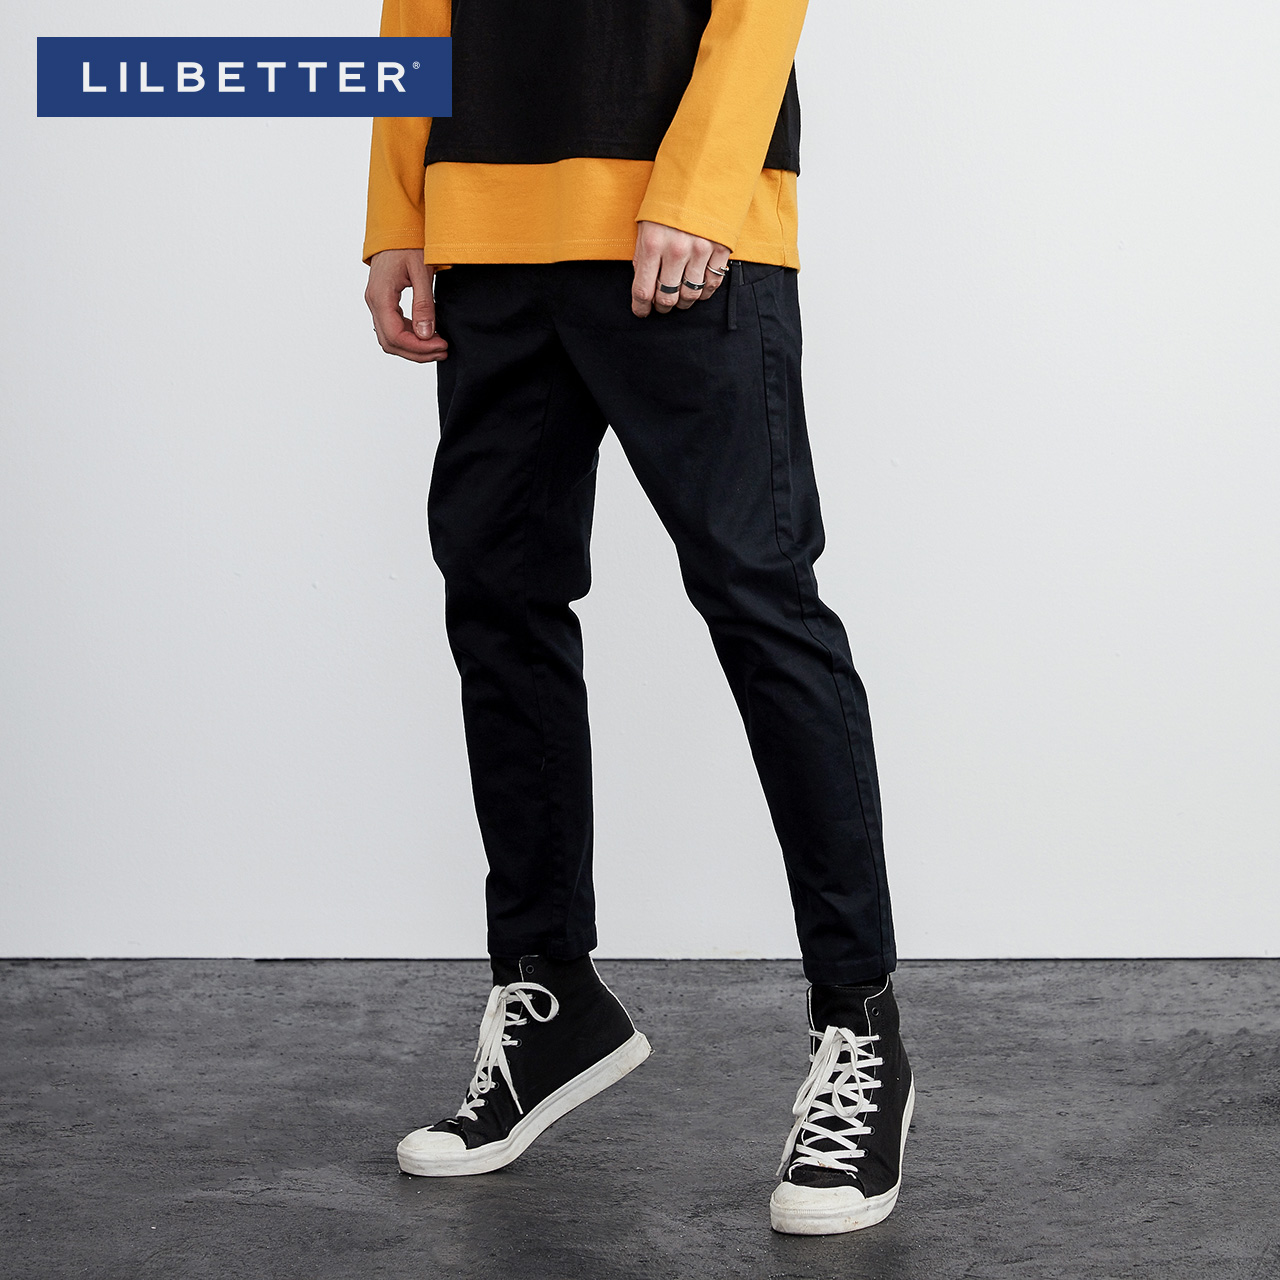 Lilbetter男士九分褲 黑色複古 褲 修身哈倫褲潮流小腳褲男